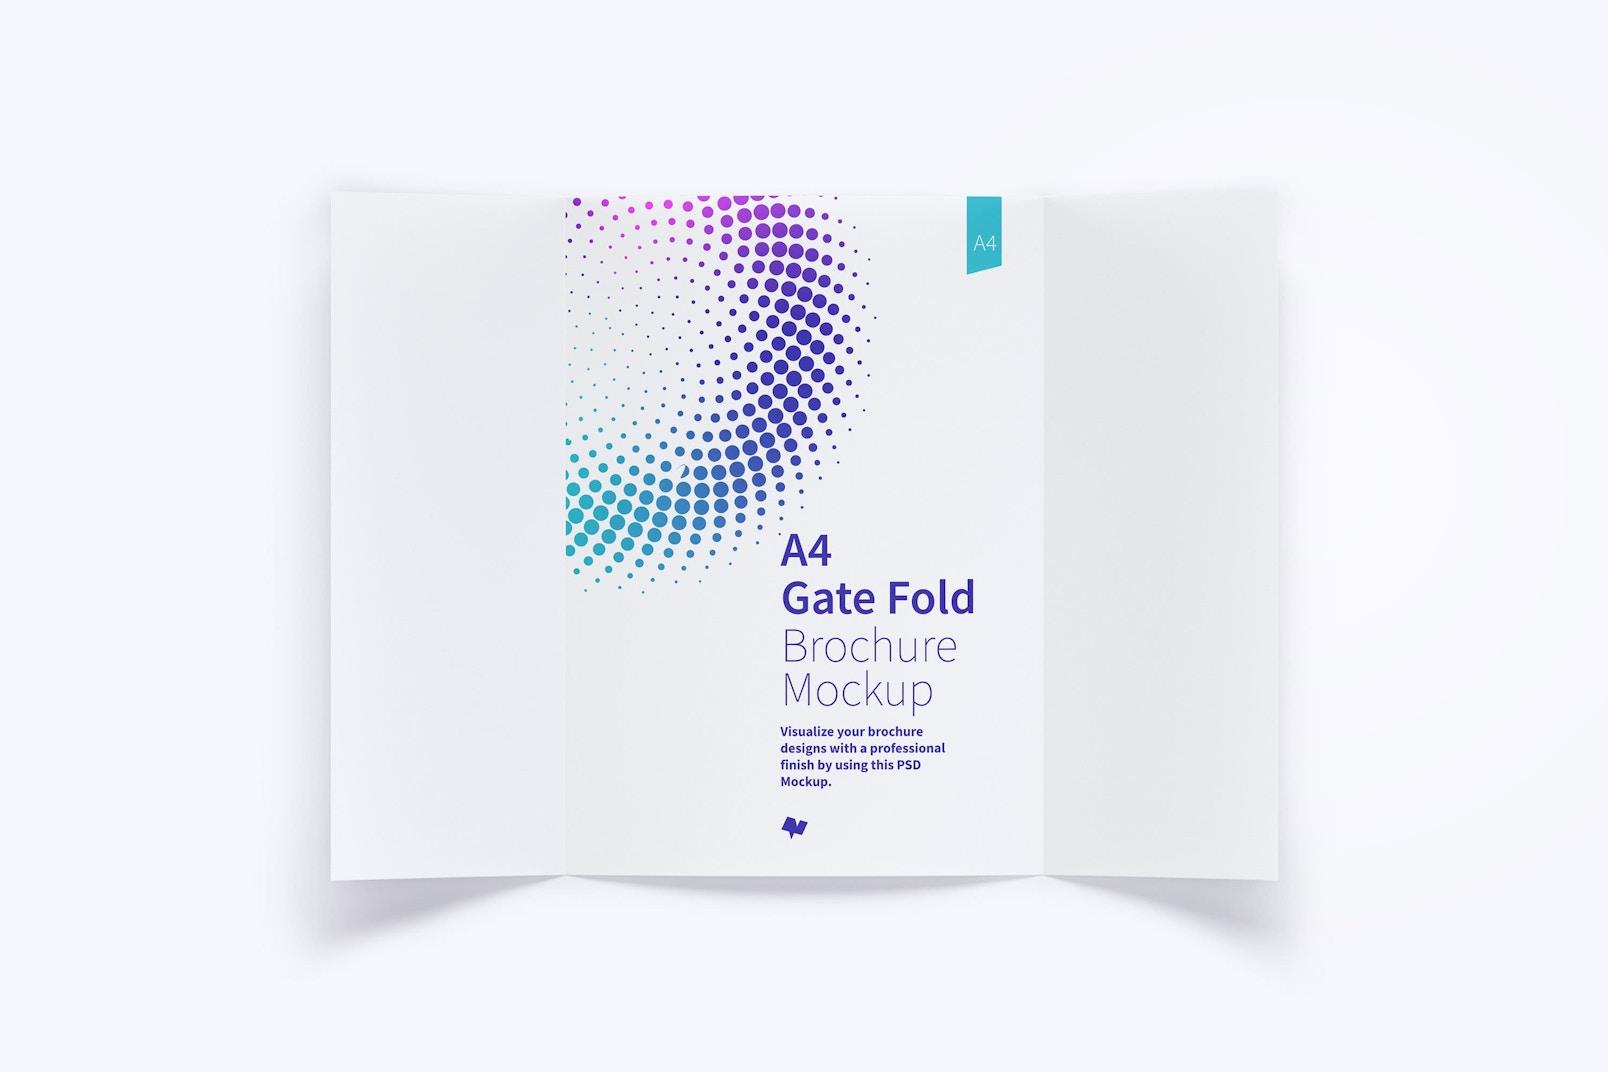 A4 Gate Fold Brochure Mockup 01